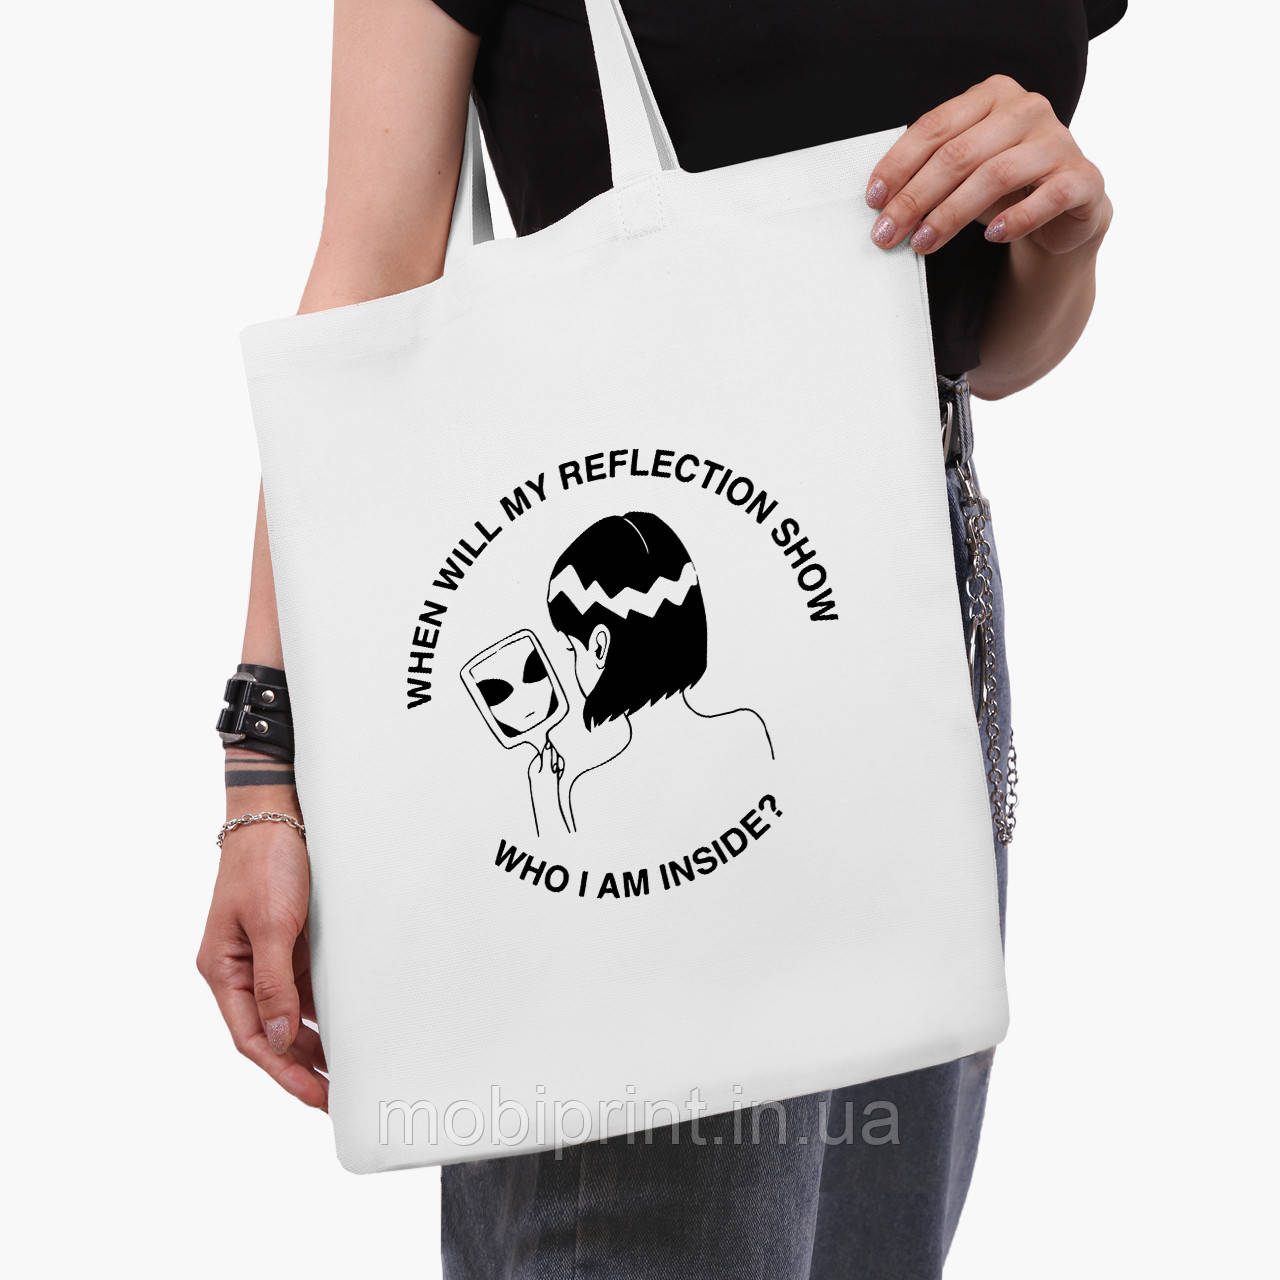 Еко сумка шоппер біла Дівчина інопланетянин (Why I am inside?) (9227-2847-3) 41*35 см